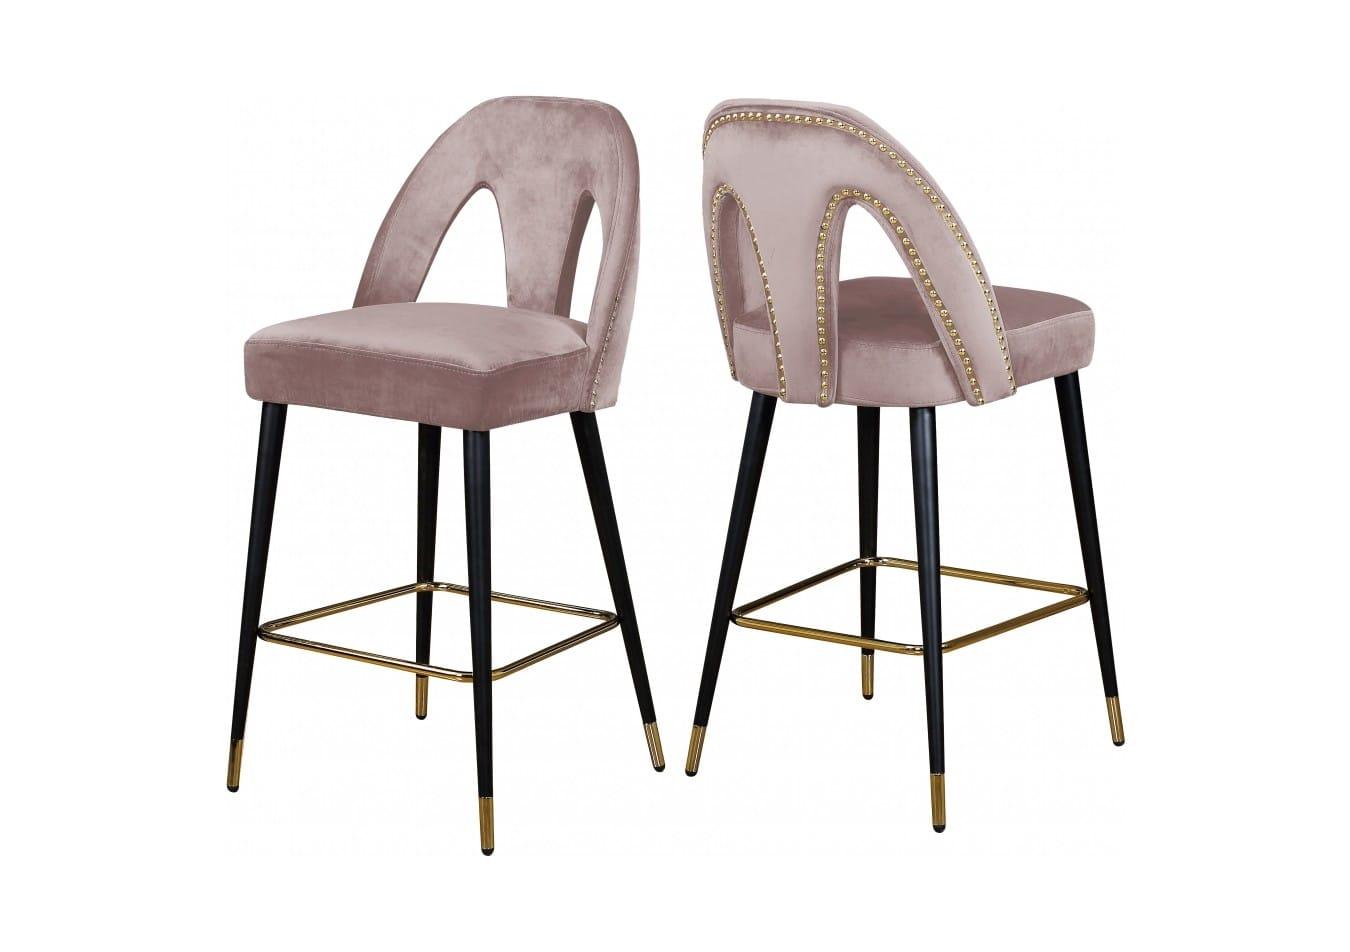 Awe Inspiring Akoya Pink Velvet Counter Stool Set Of 2 By Meridian Furniture Cjindustries Chair Design For Home Cjindustriesco